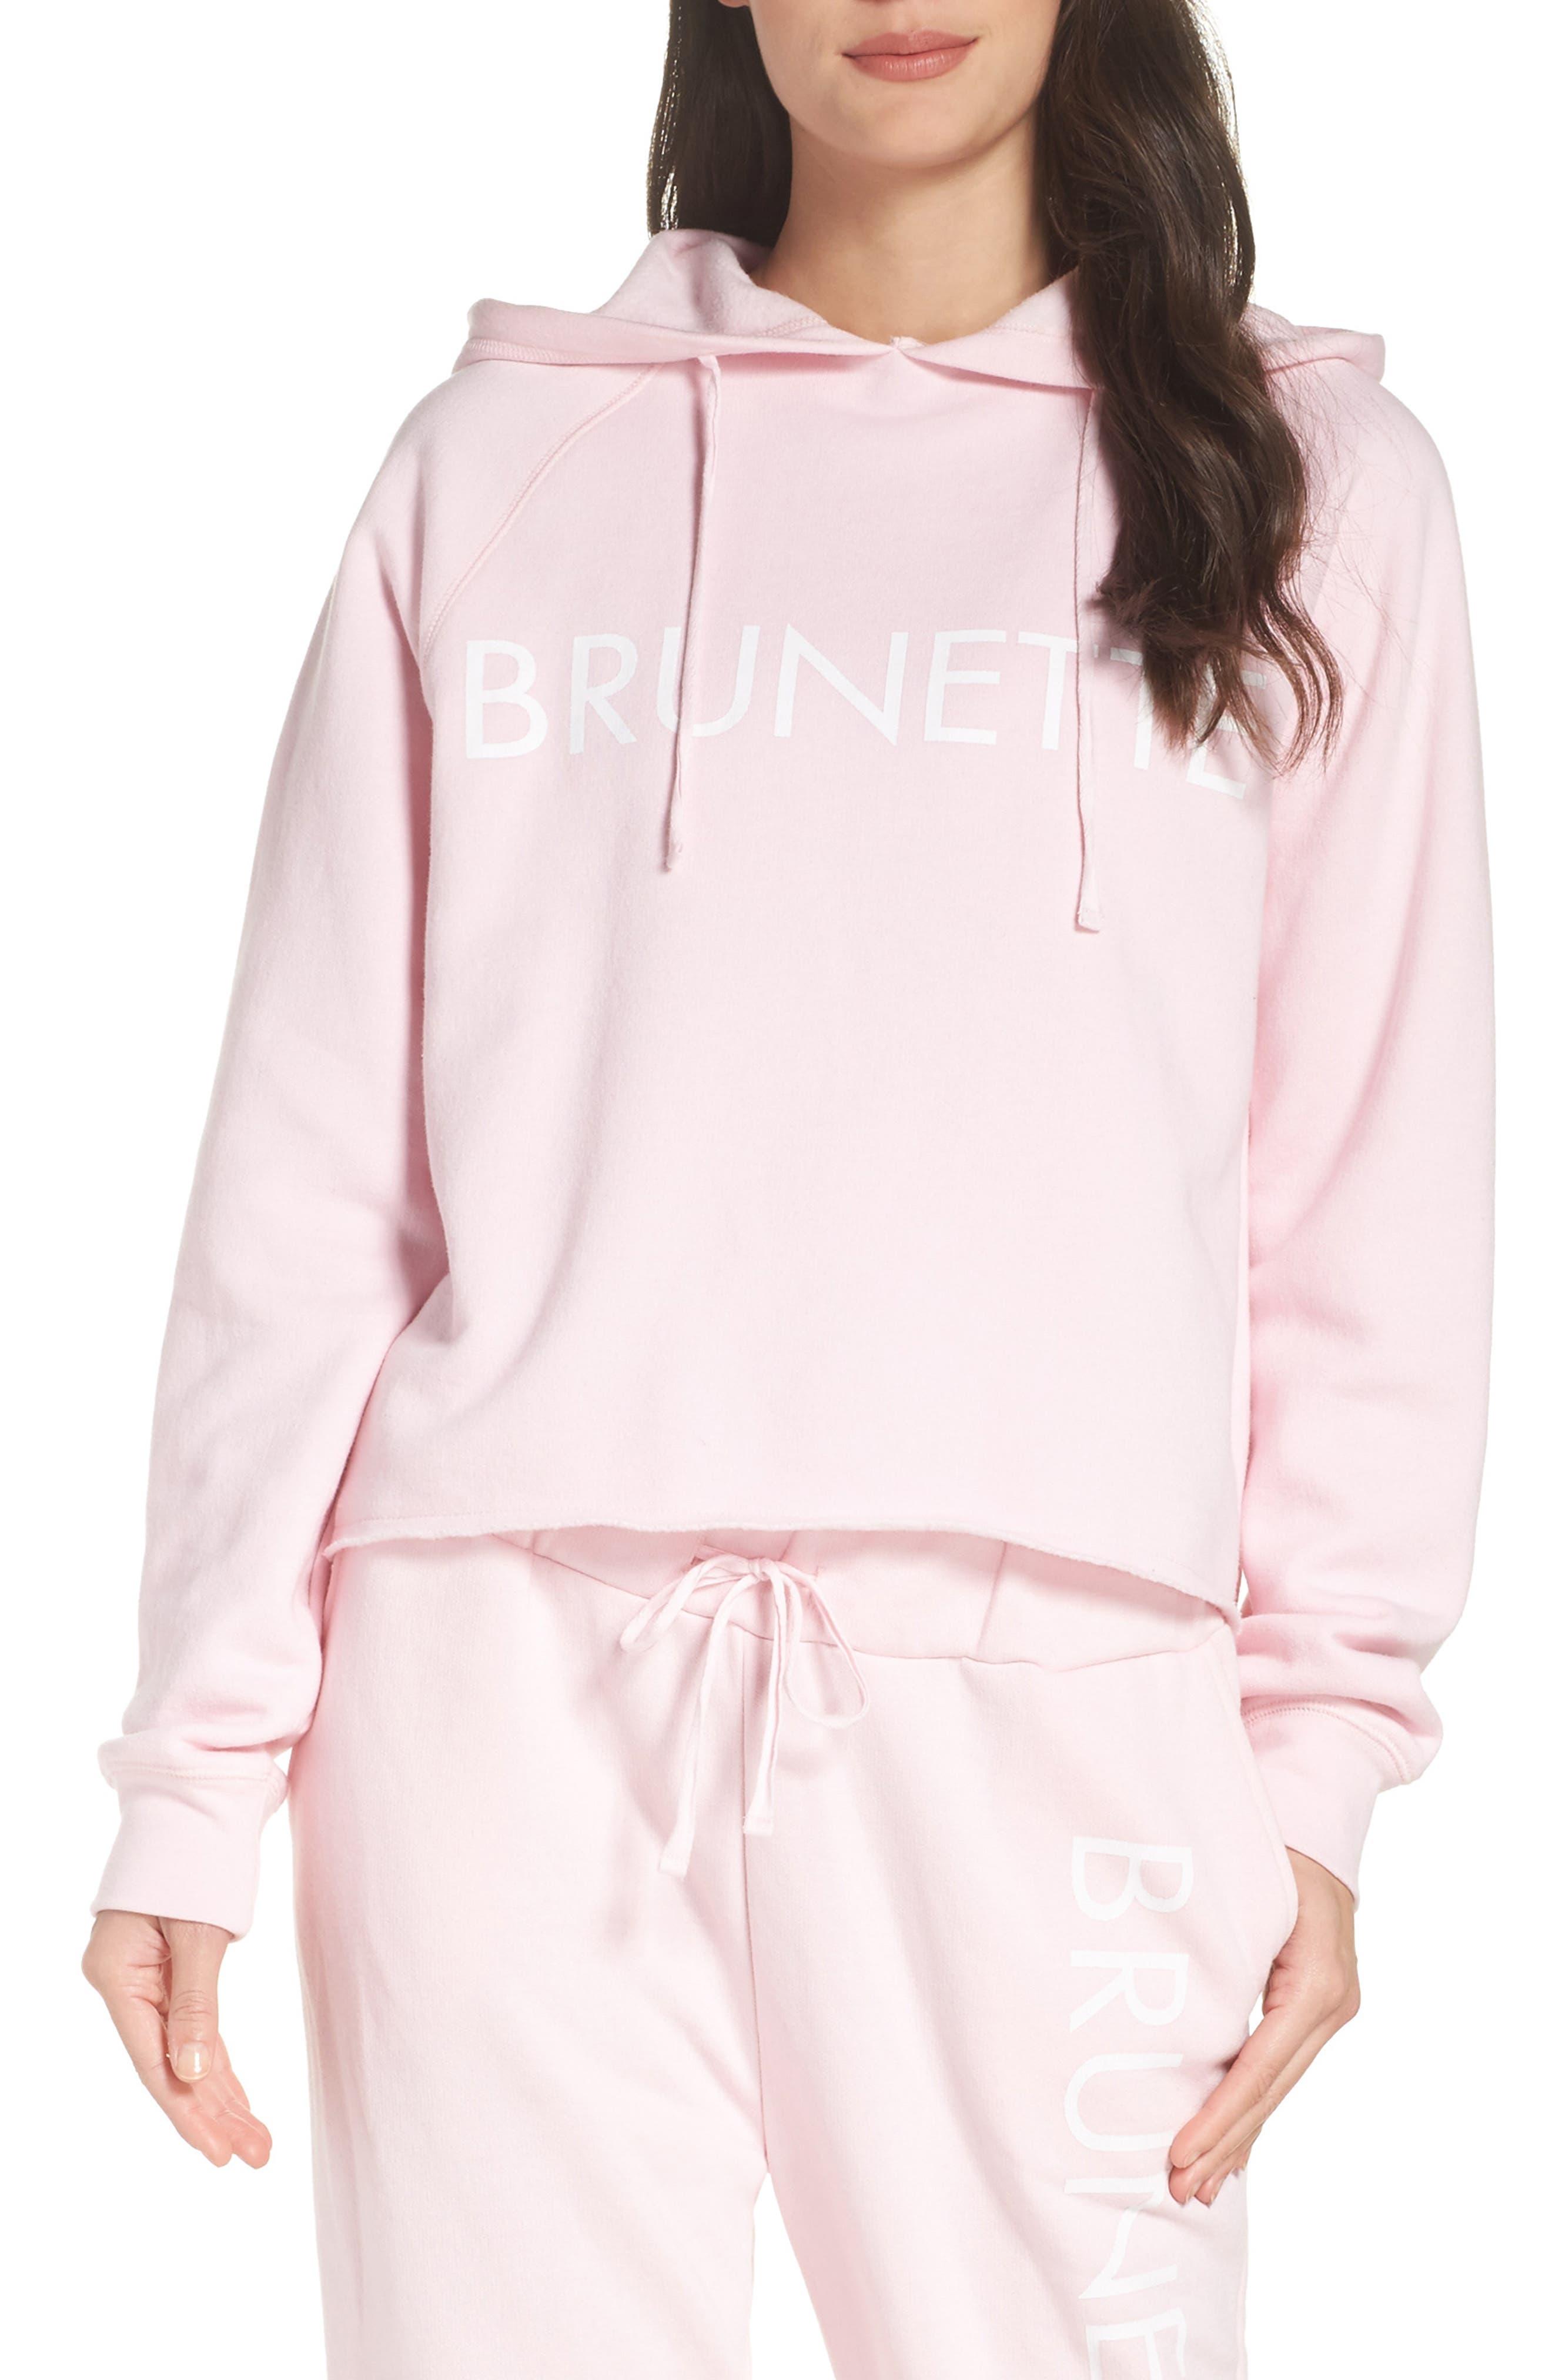 Middle Sister - Brunette Hoodie,                         Main,                         color, Pink